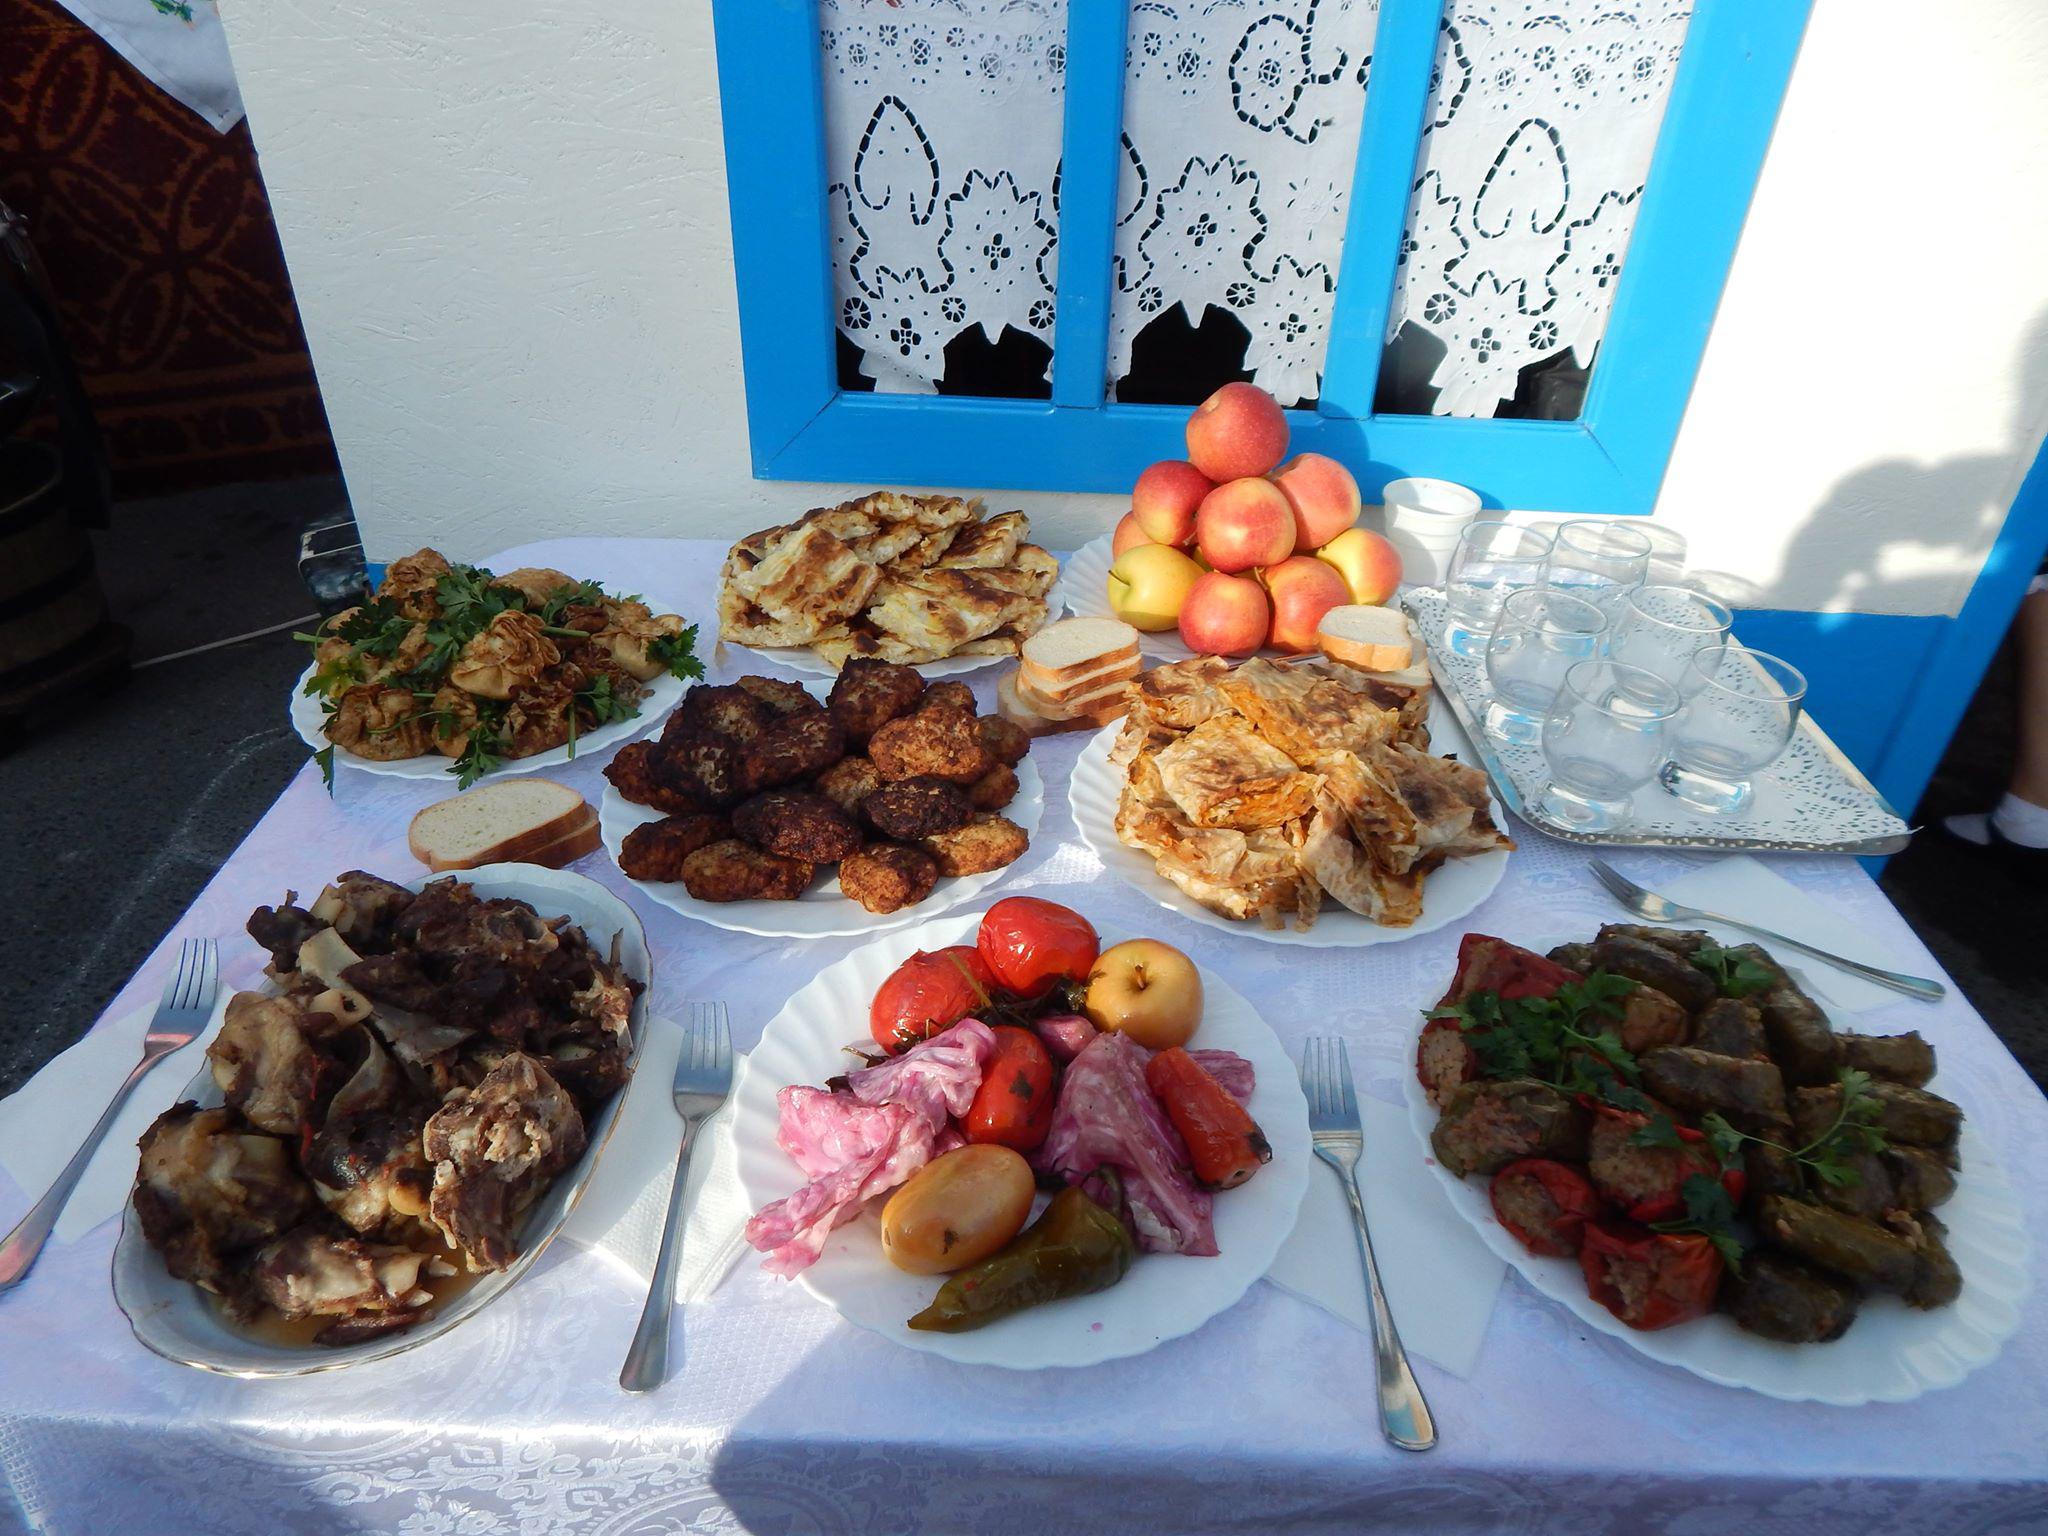 Блюда гагаузов. Среди угощений на столе — кыырма и каурма. Фрто: из архива О. Кулаксыз